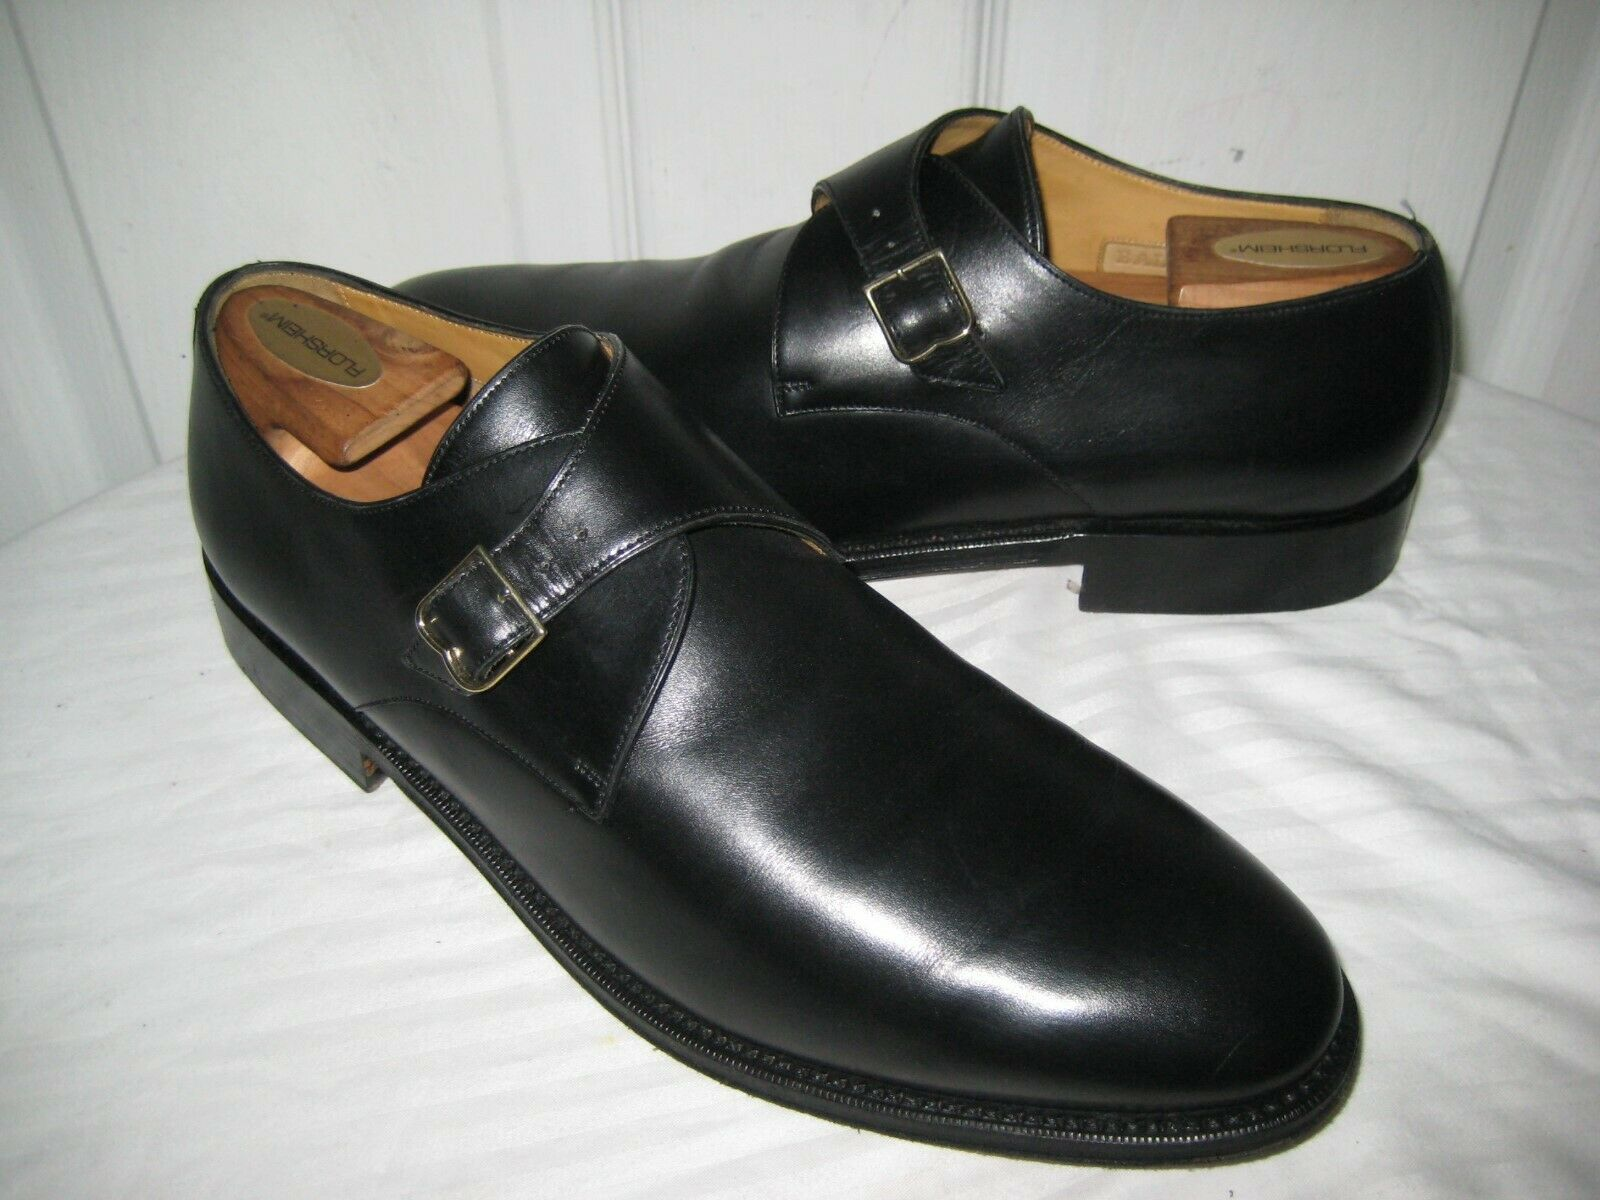 BALLY BALLY BALLY nero  Leather  Monk Strap scarpe US Men Dimensione 10.5 Made In Switzerland. 4f74fd